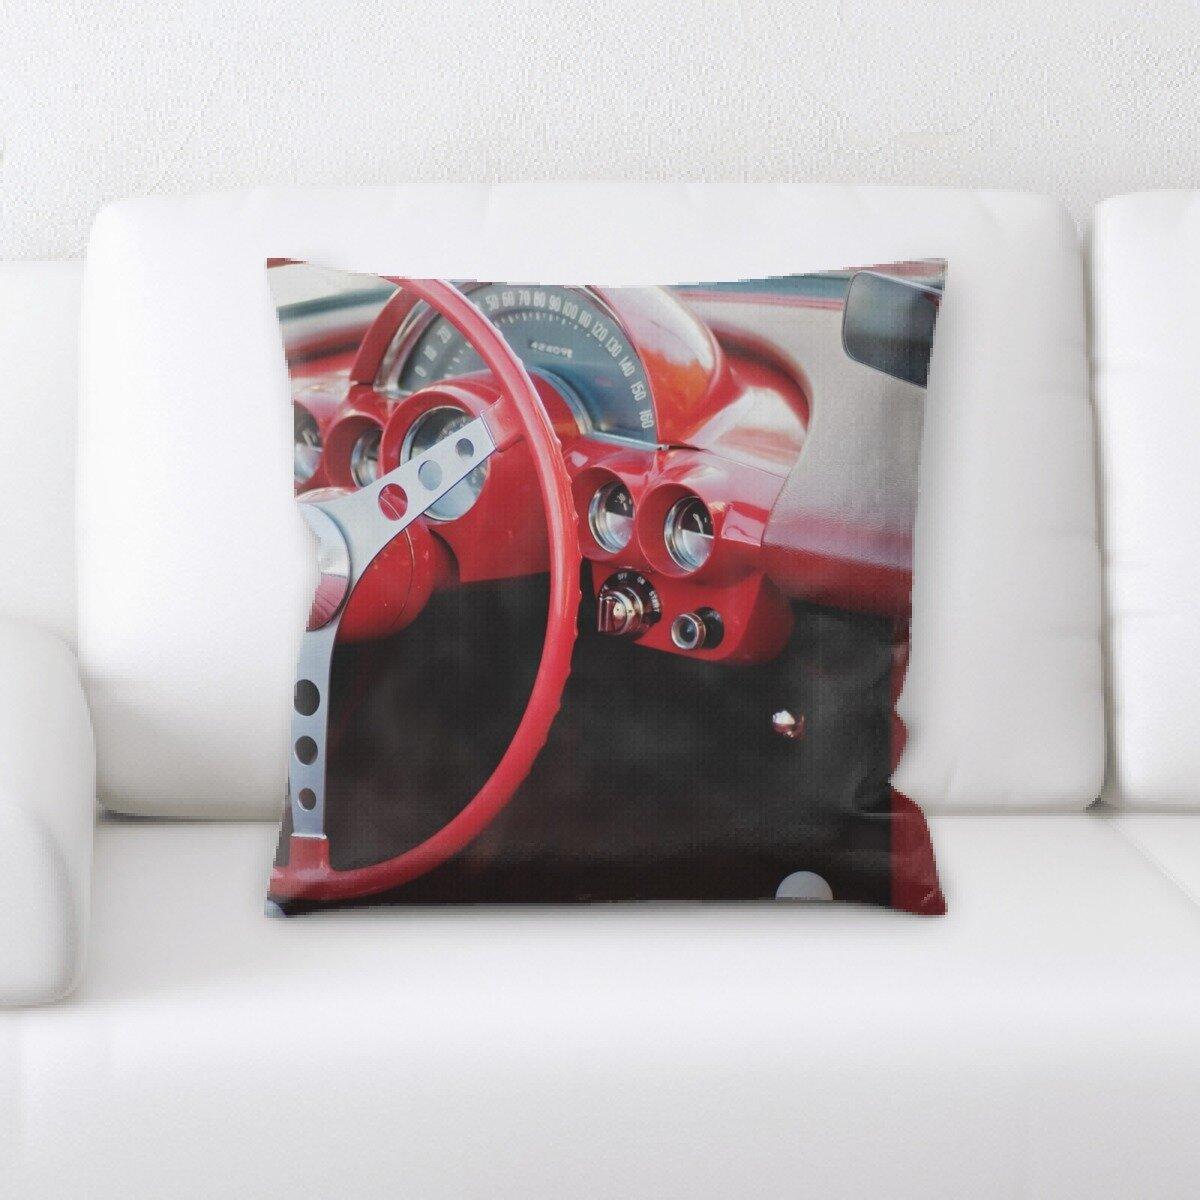 Rug Tycoon Steering Wheel Throw Pillow